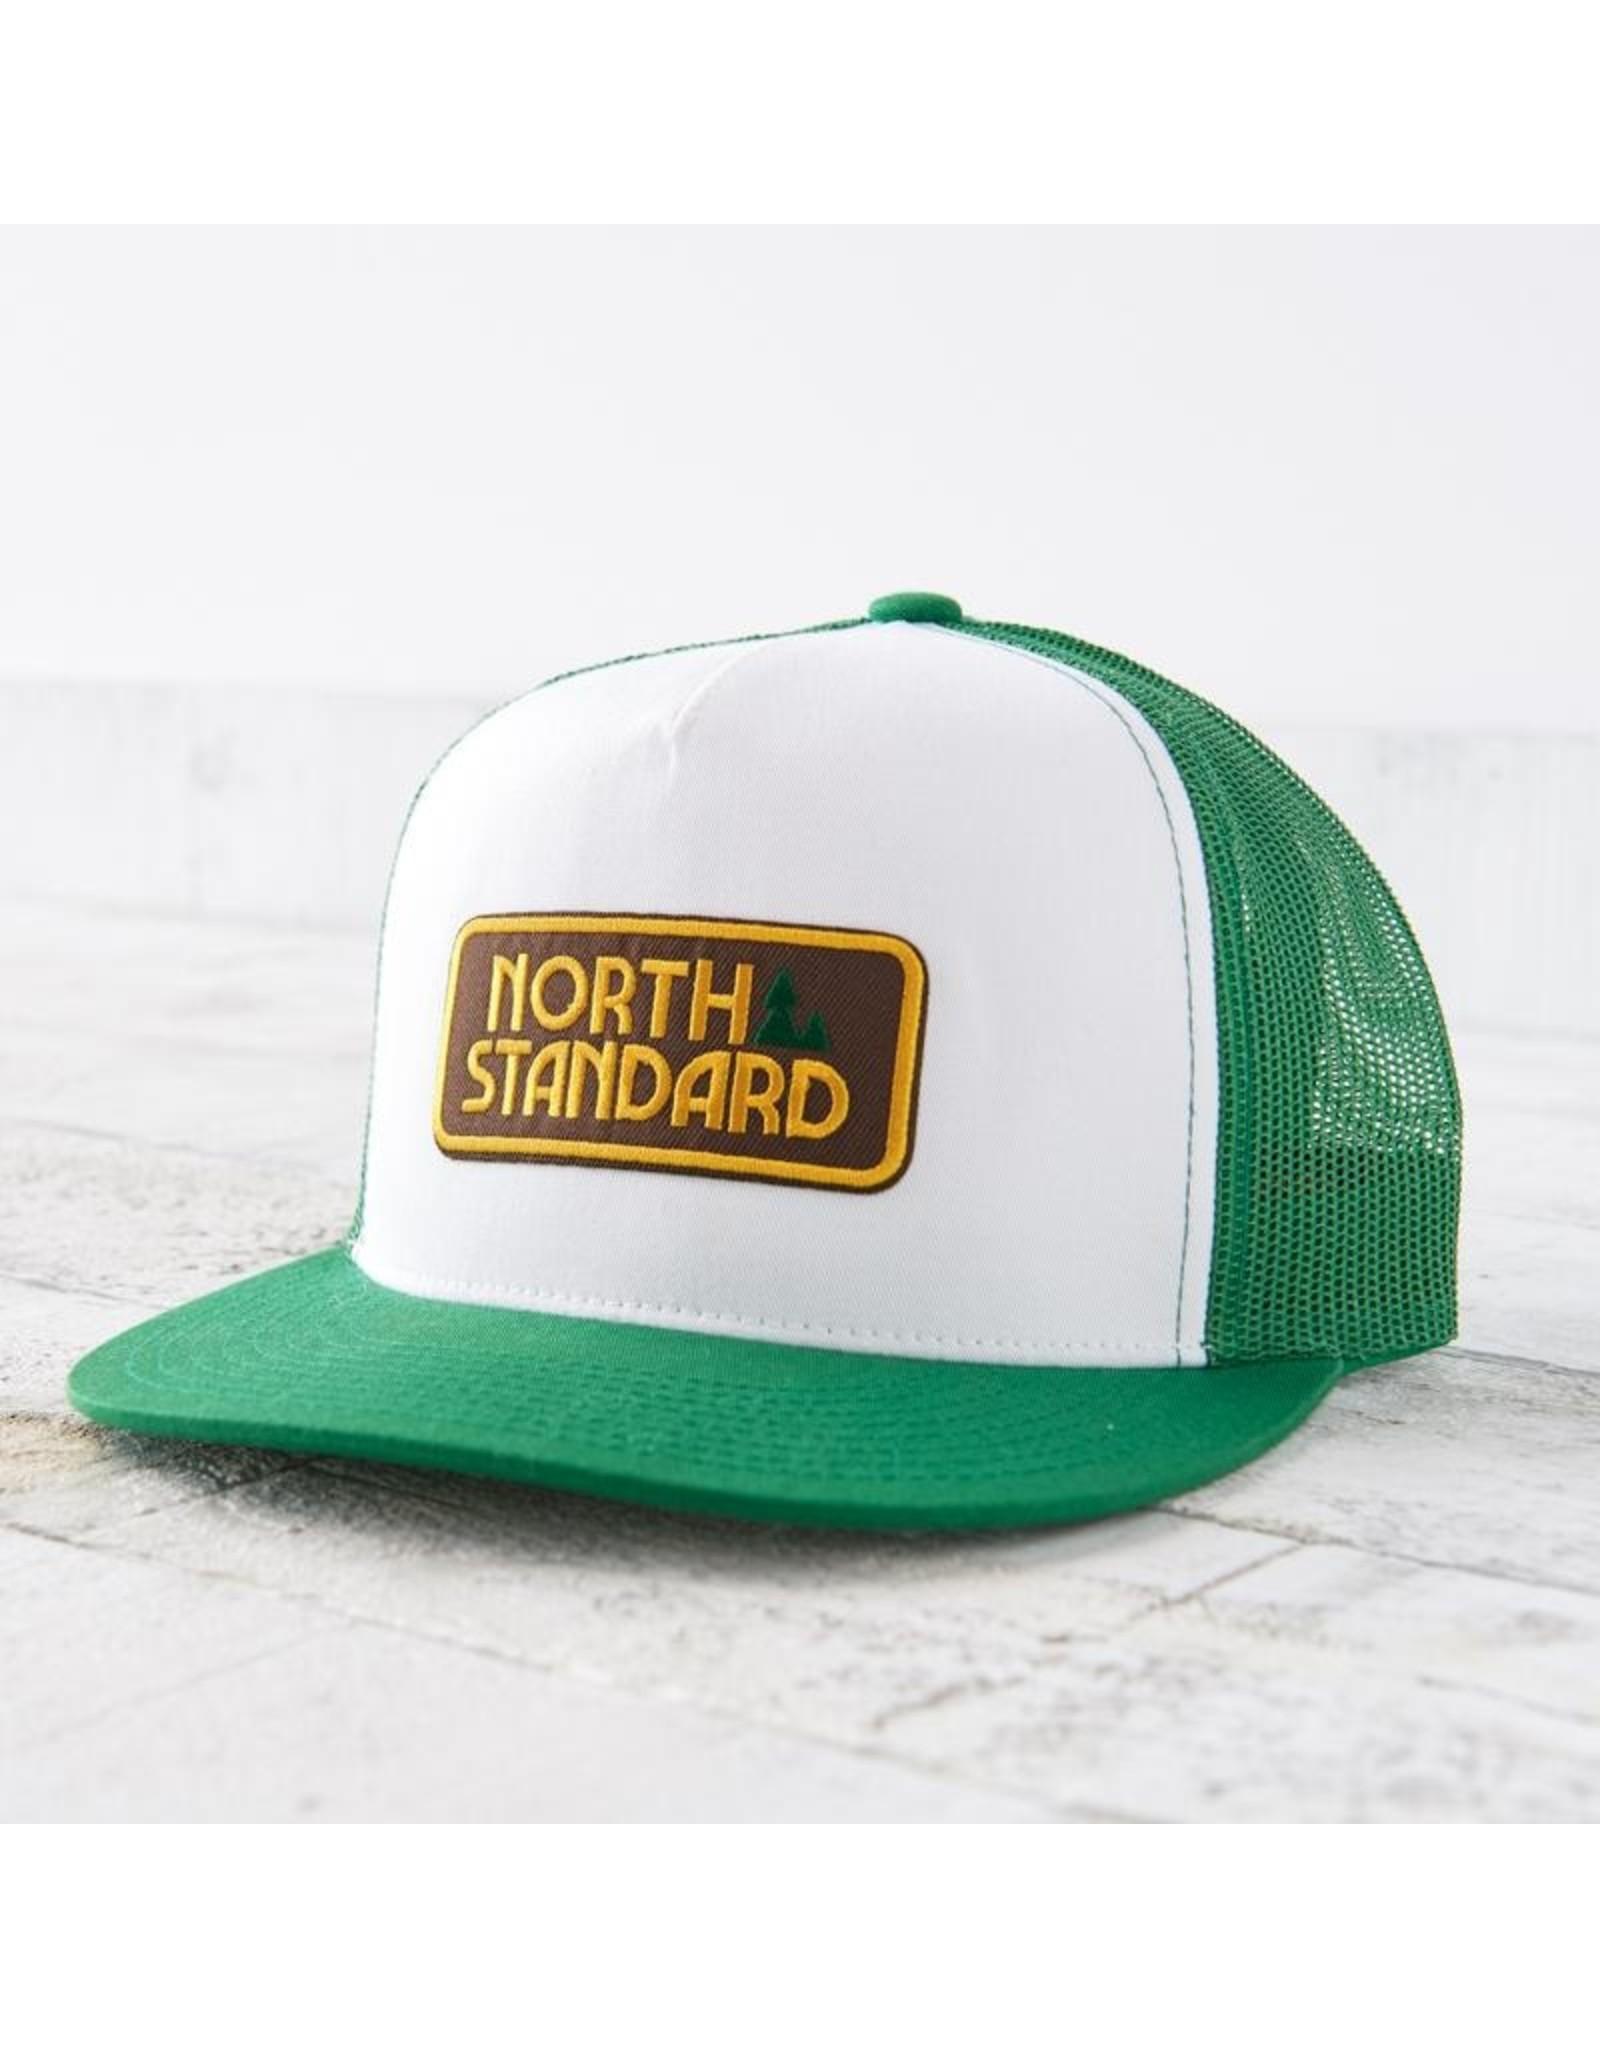 North Standard North Standard - Hat Kelly/Wh w Brown Woodlands